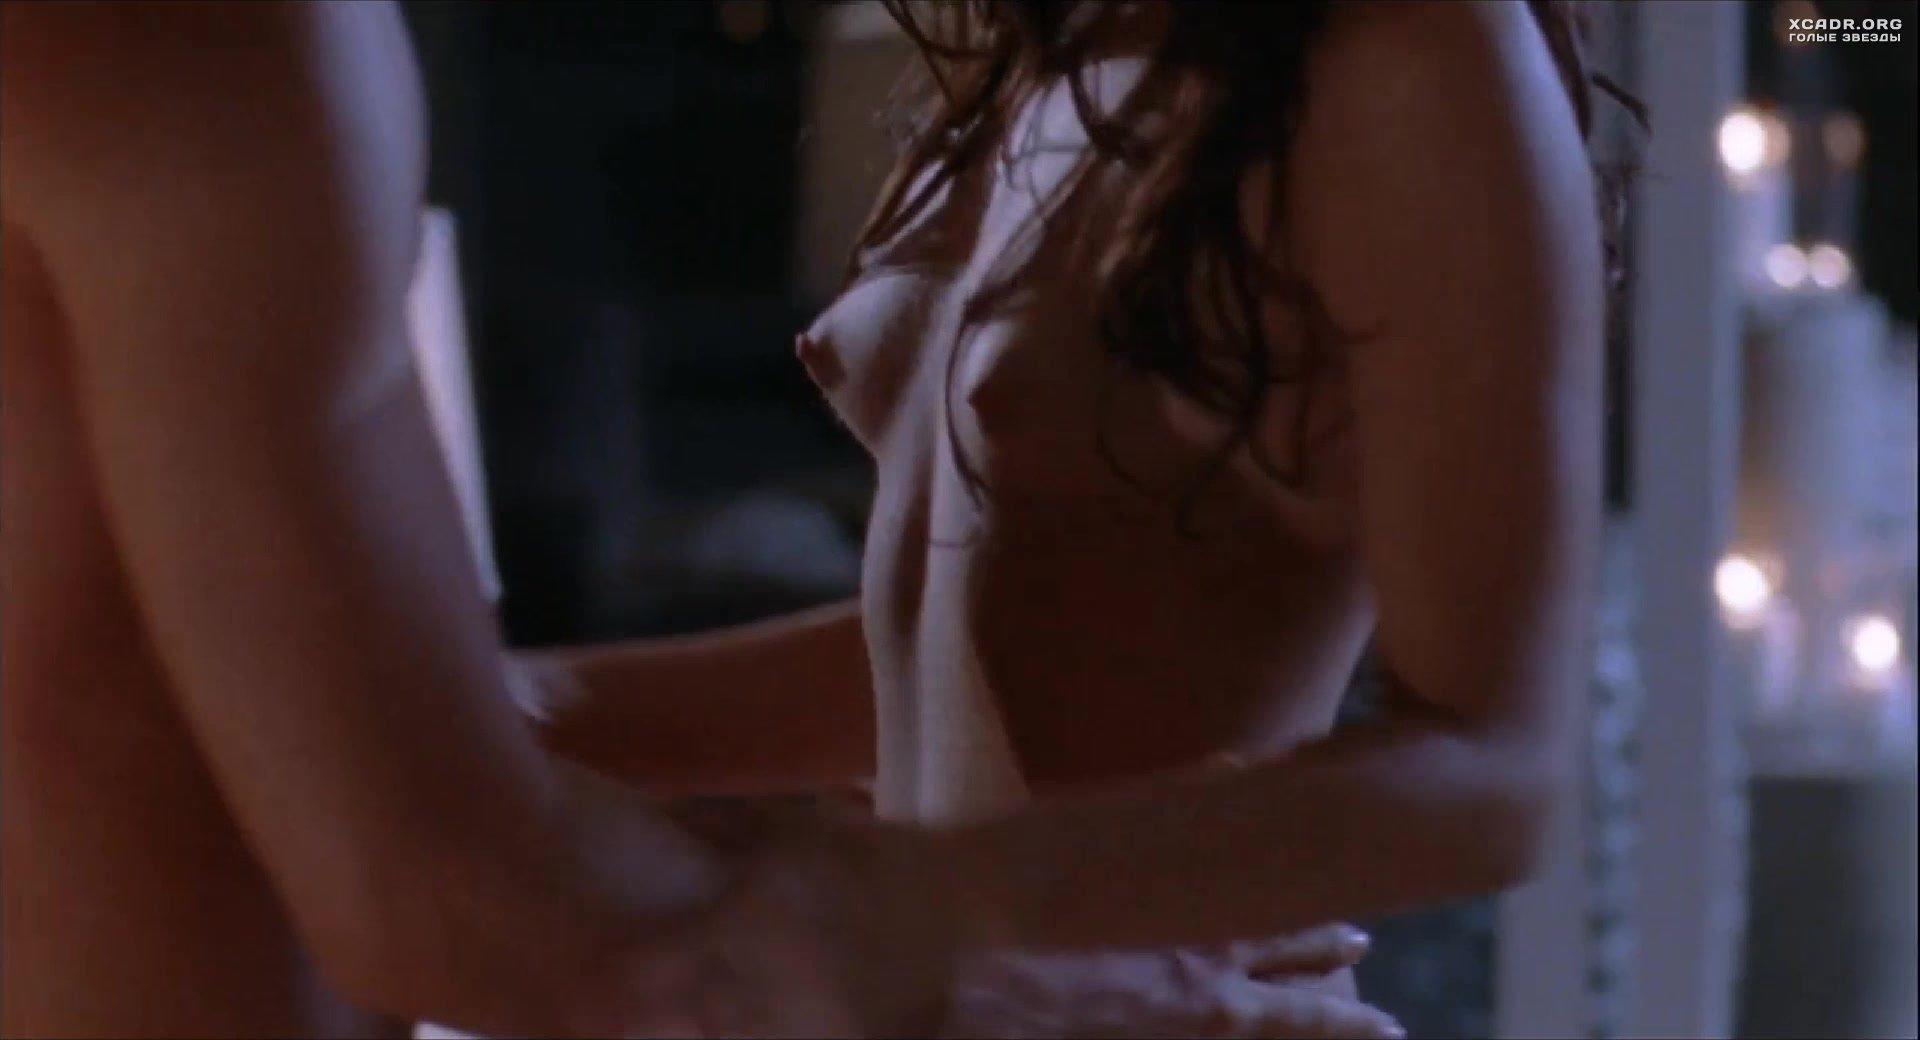 Jessie nickson nude, asian pussy fucks huge cock videos